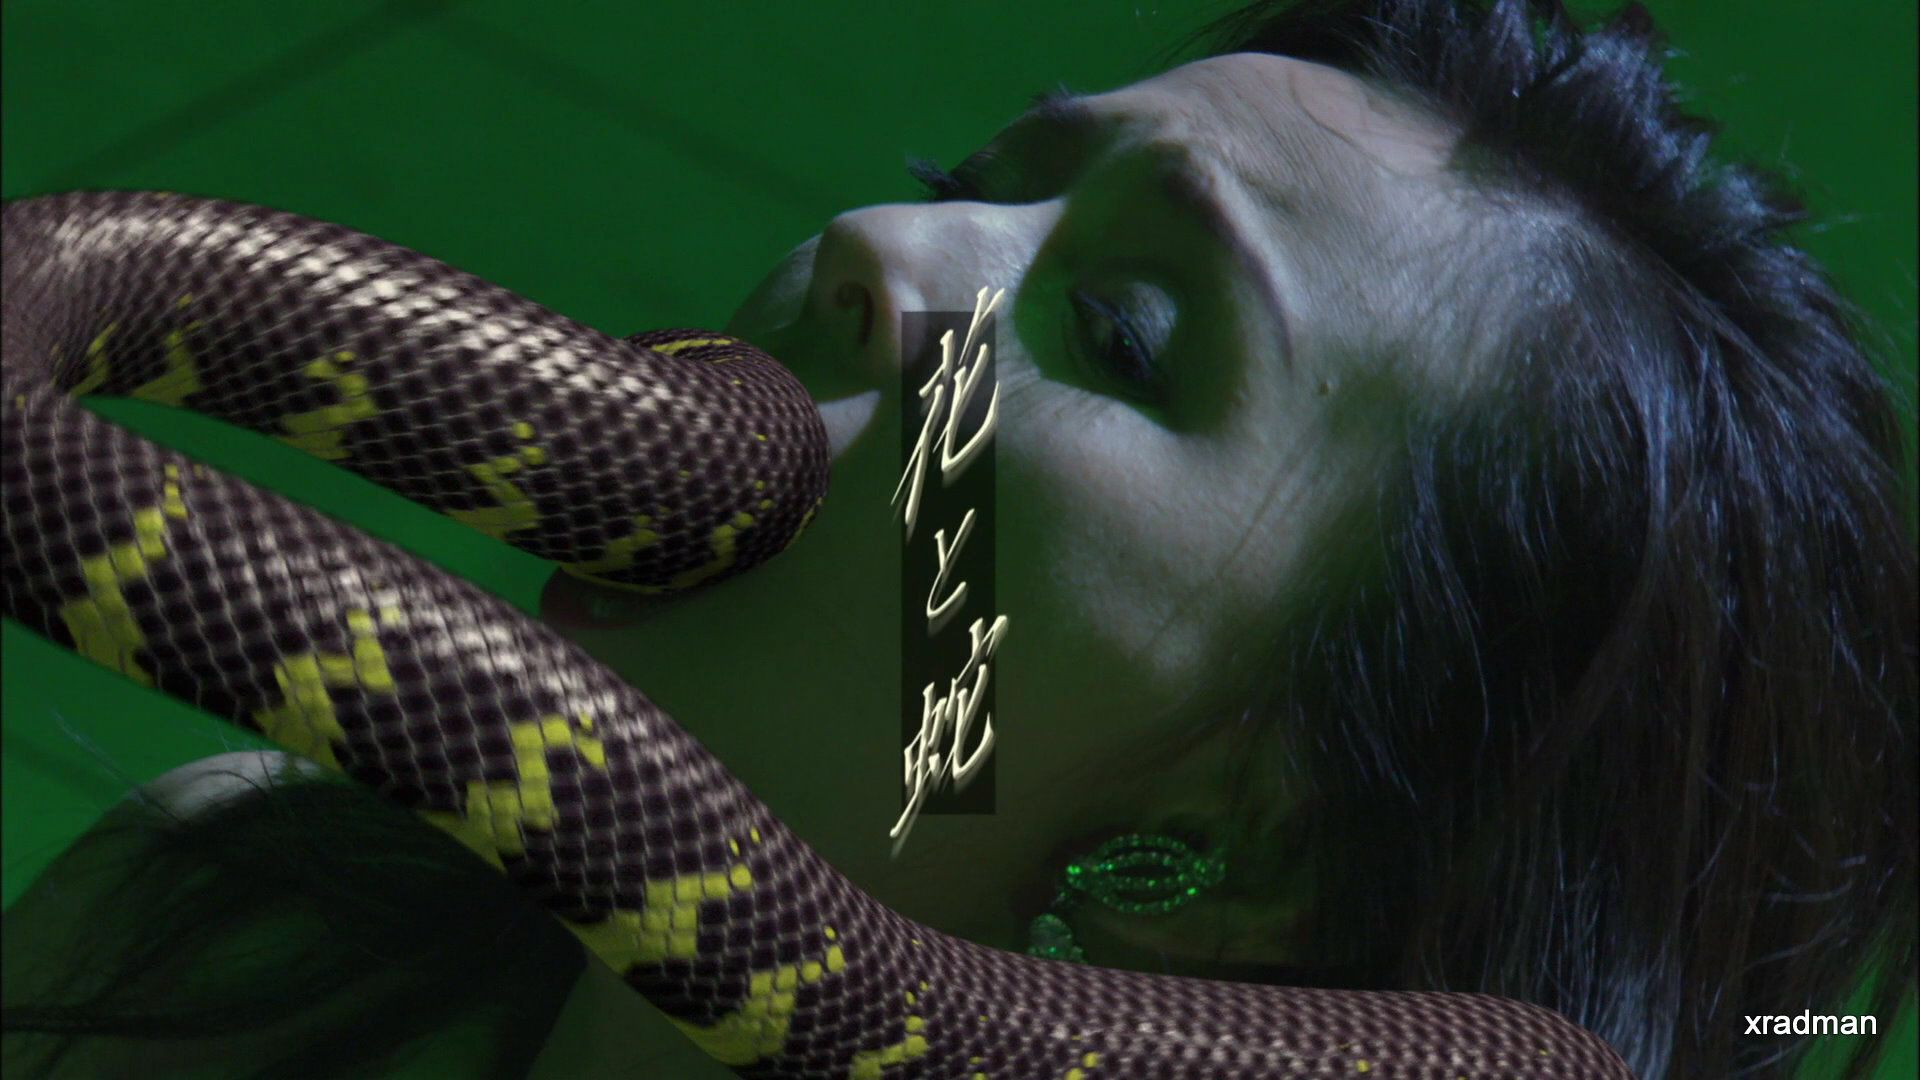 flower and snake 2004 english subtitles